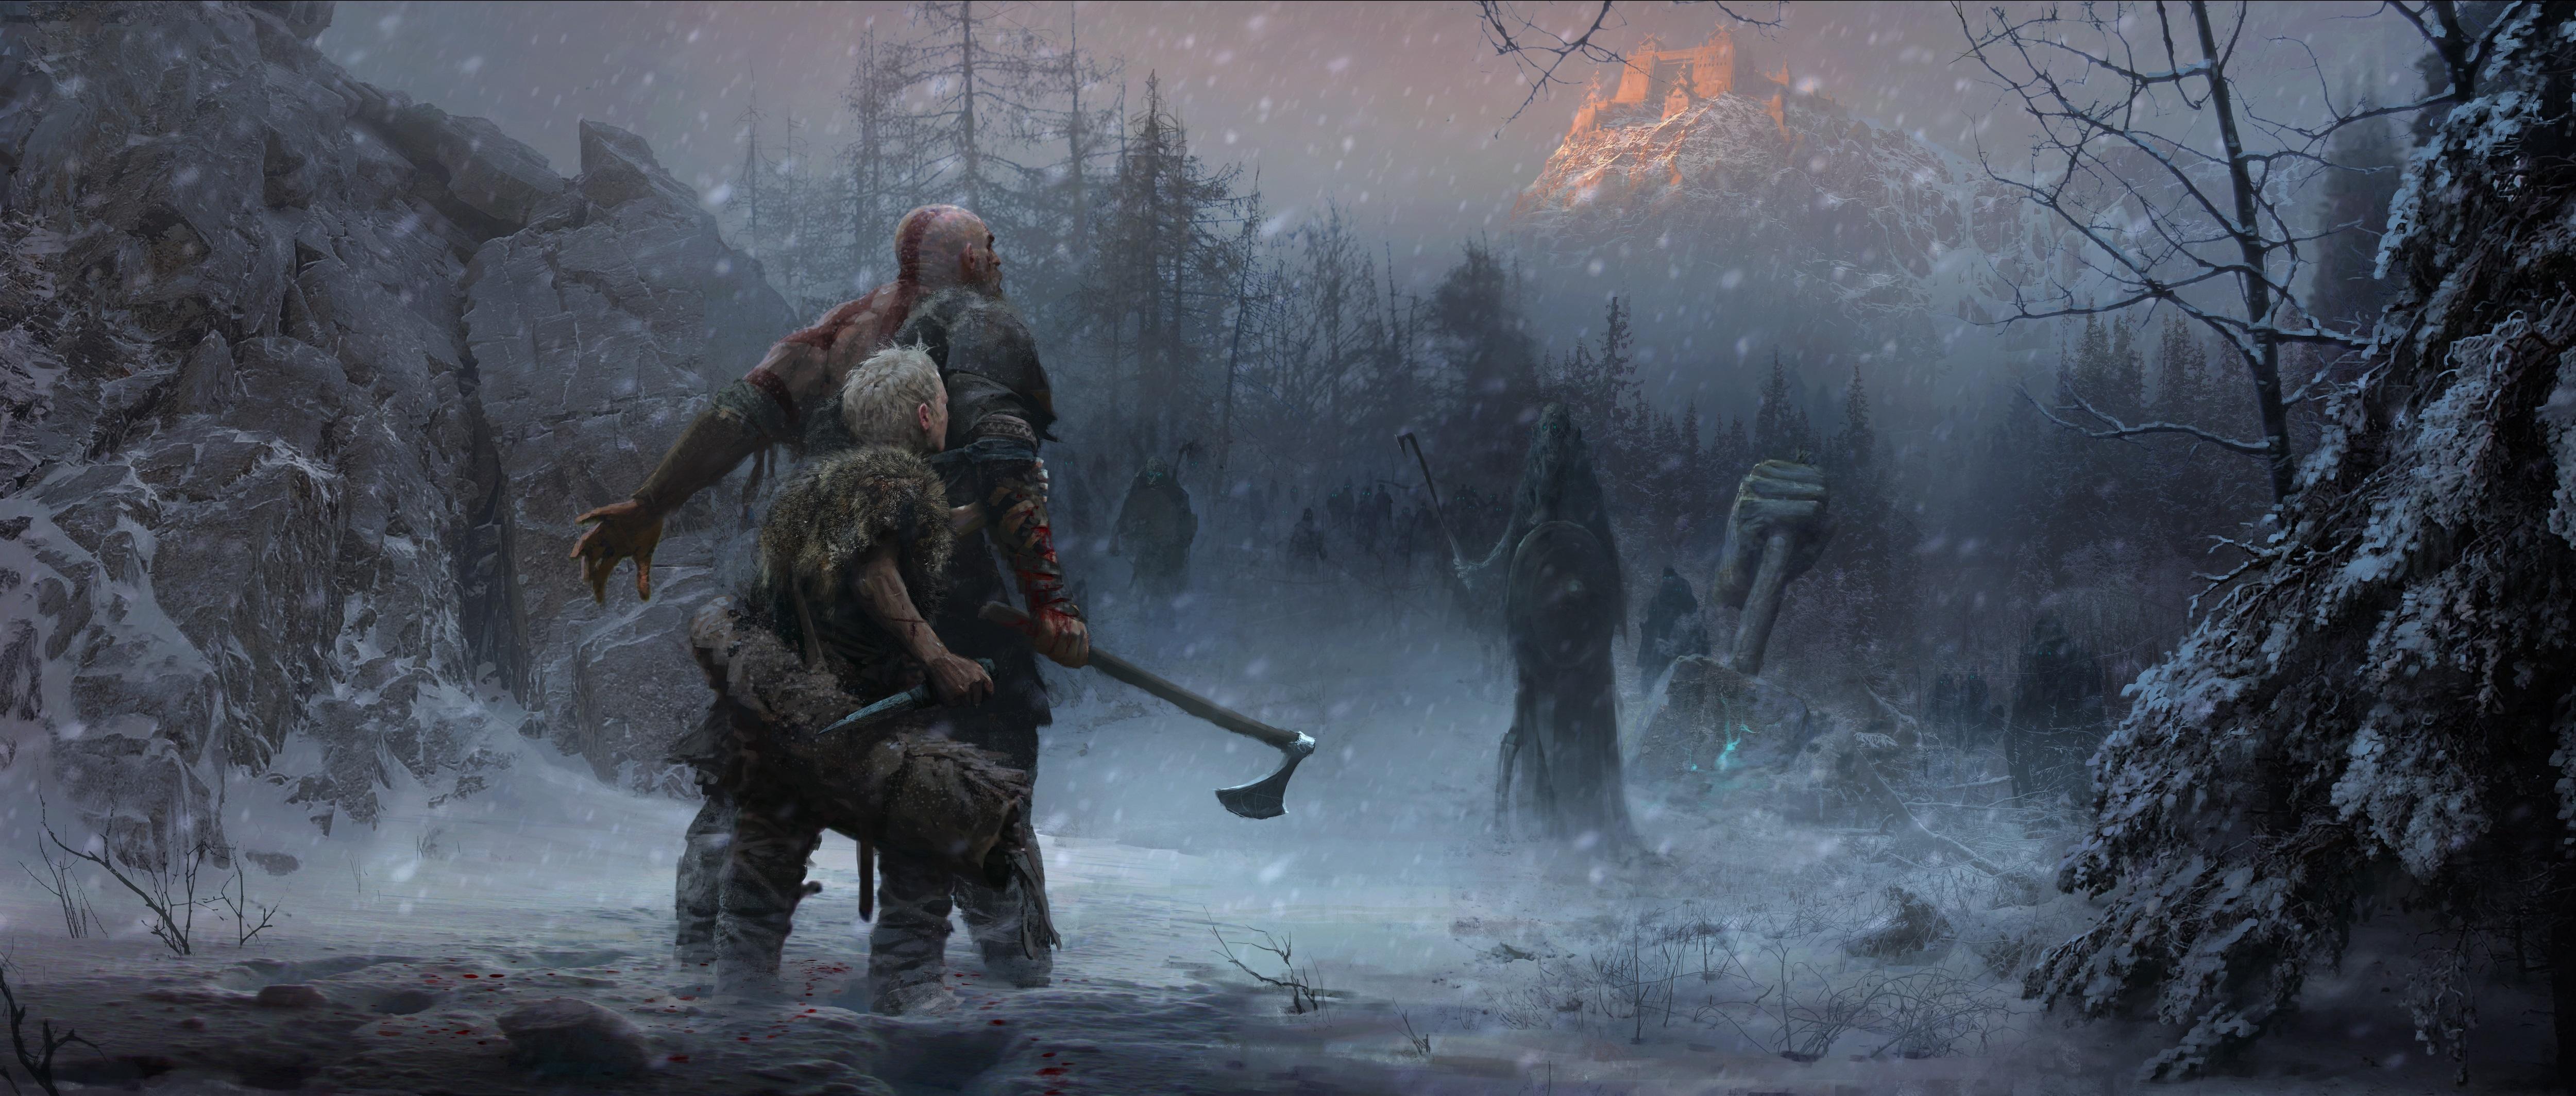 God Of War 4 Ps4 Concept Art 5k Hd Games 4k Wallpapers Images